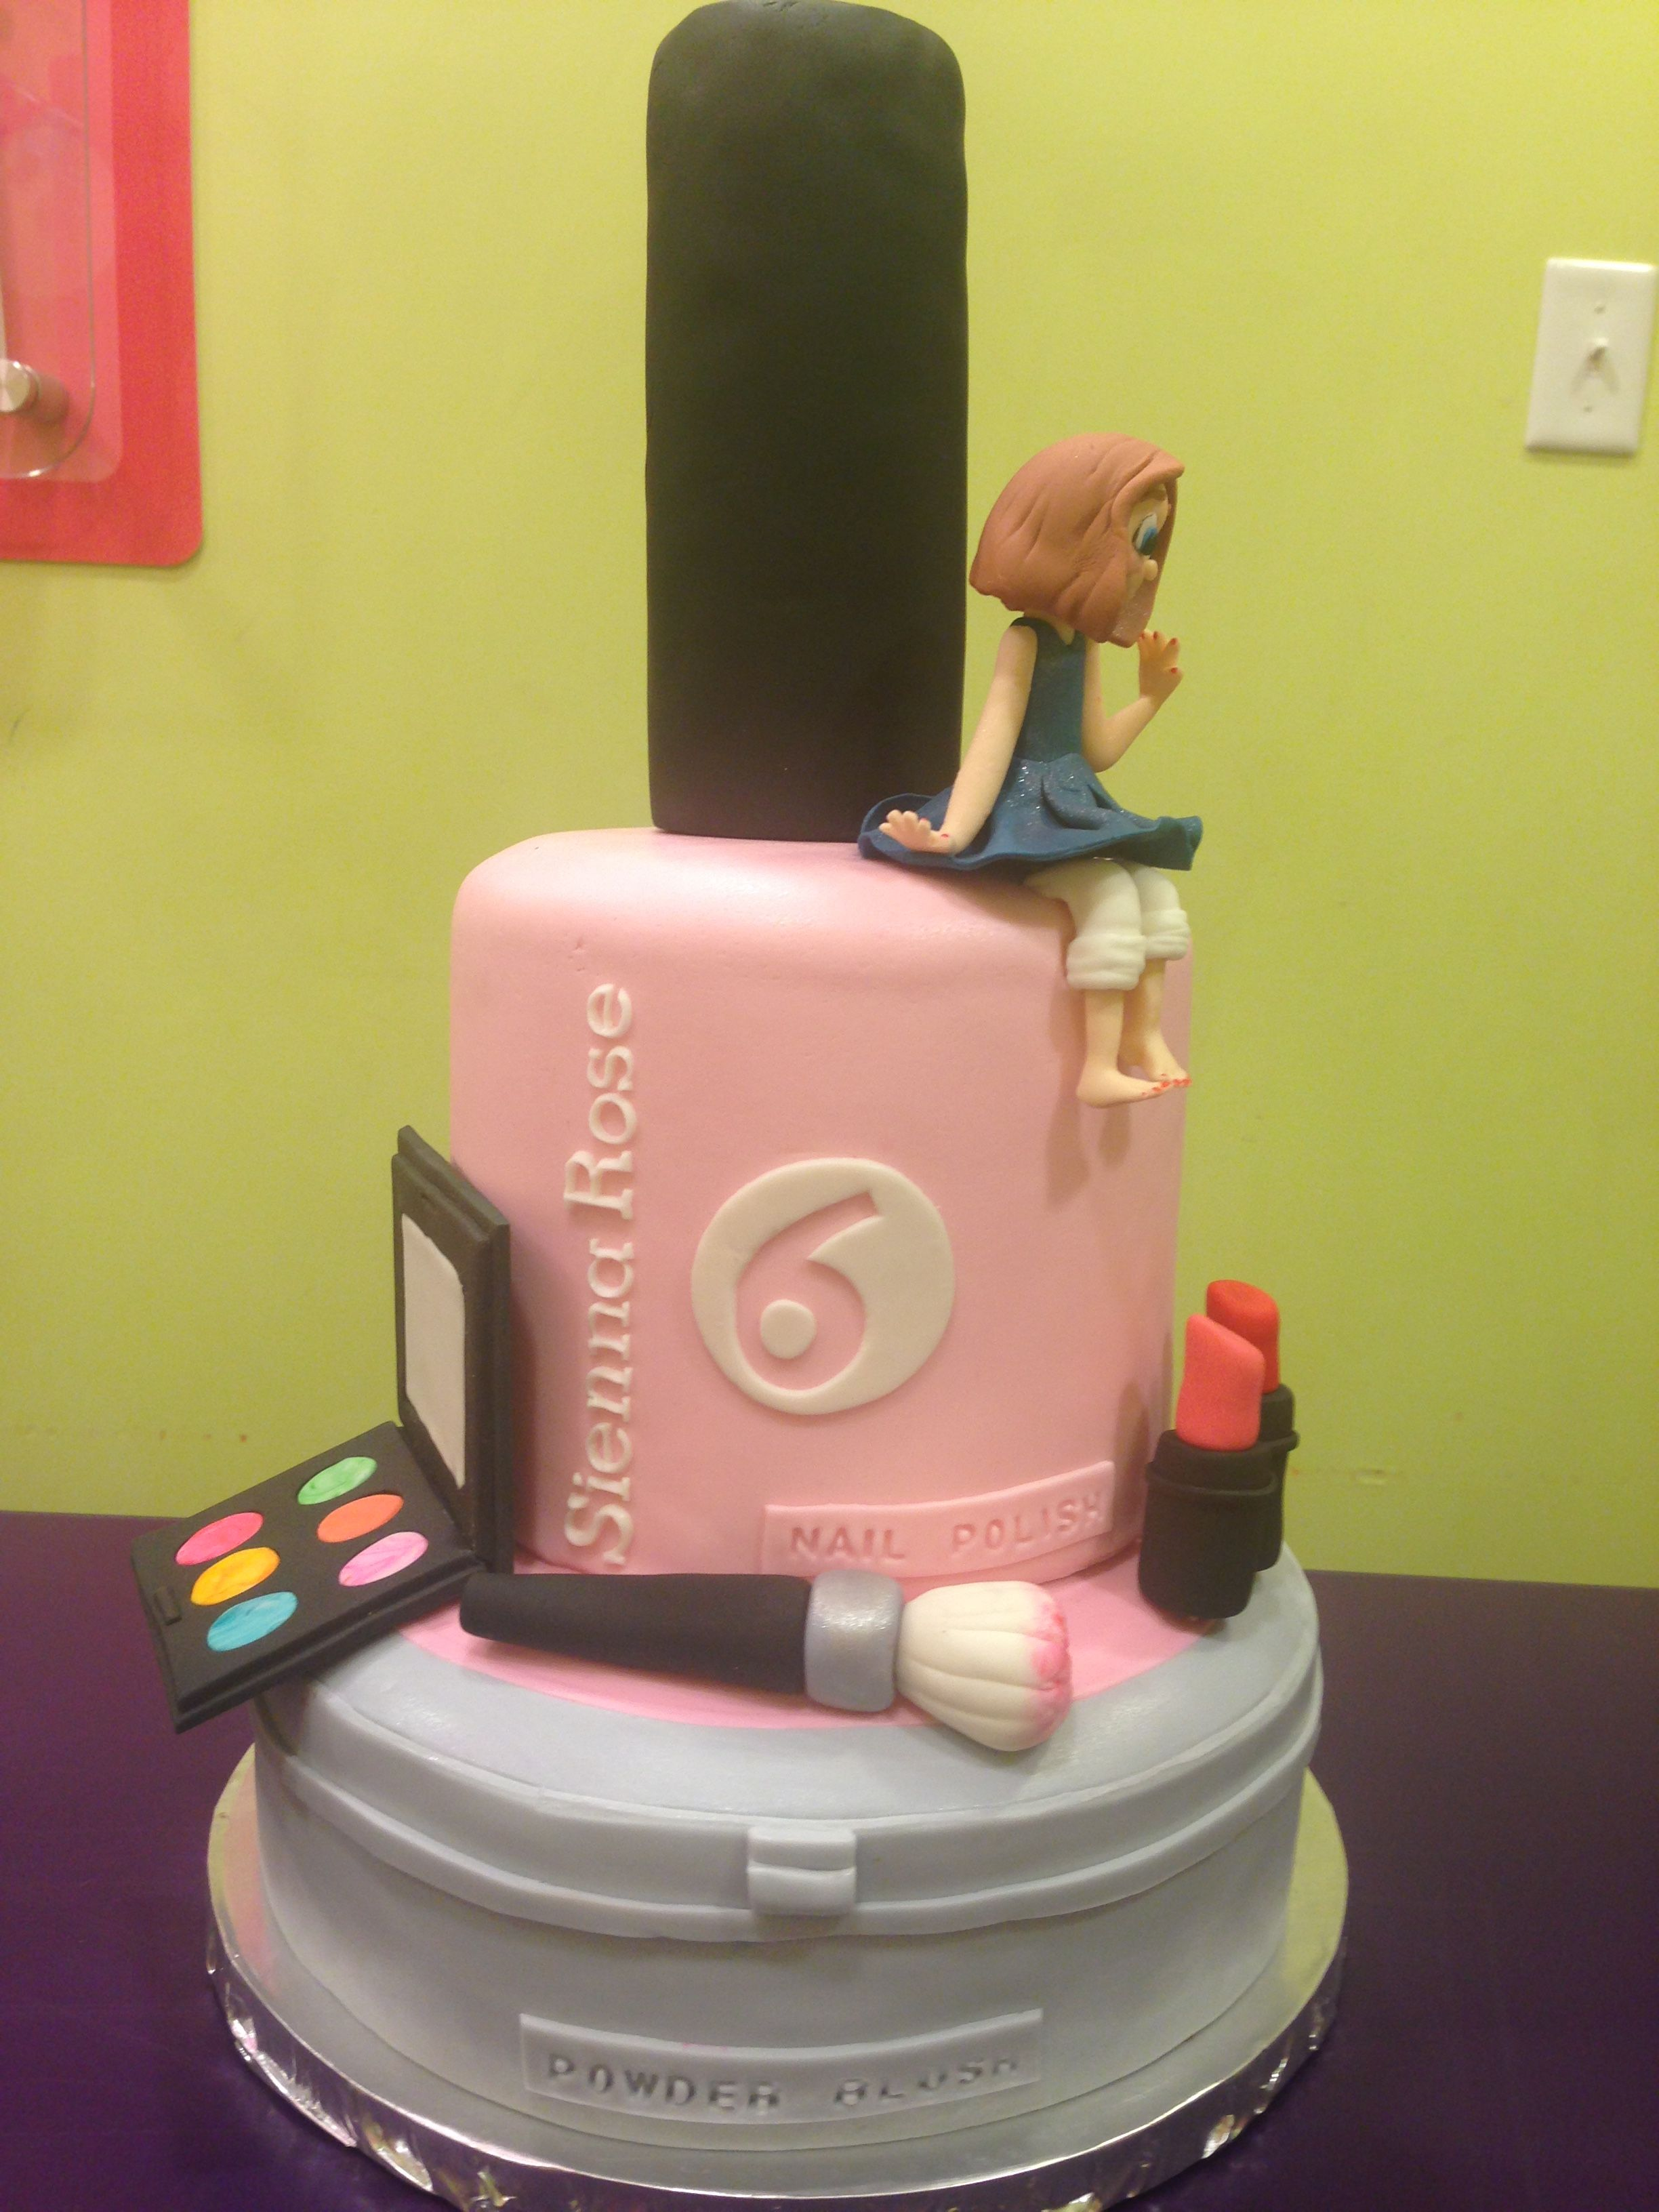 Salon Birthday Party Cake Party Cakes Cake Birthday Party Cake